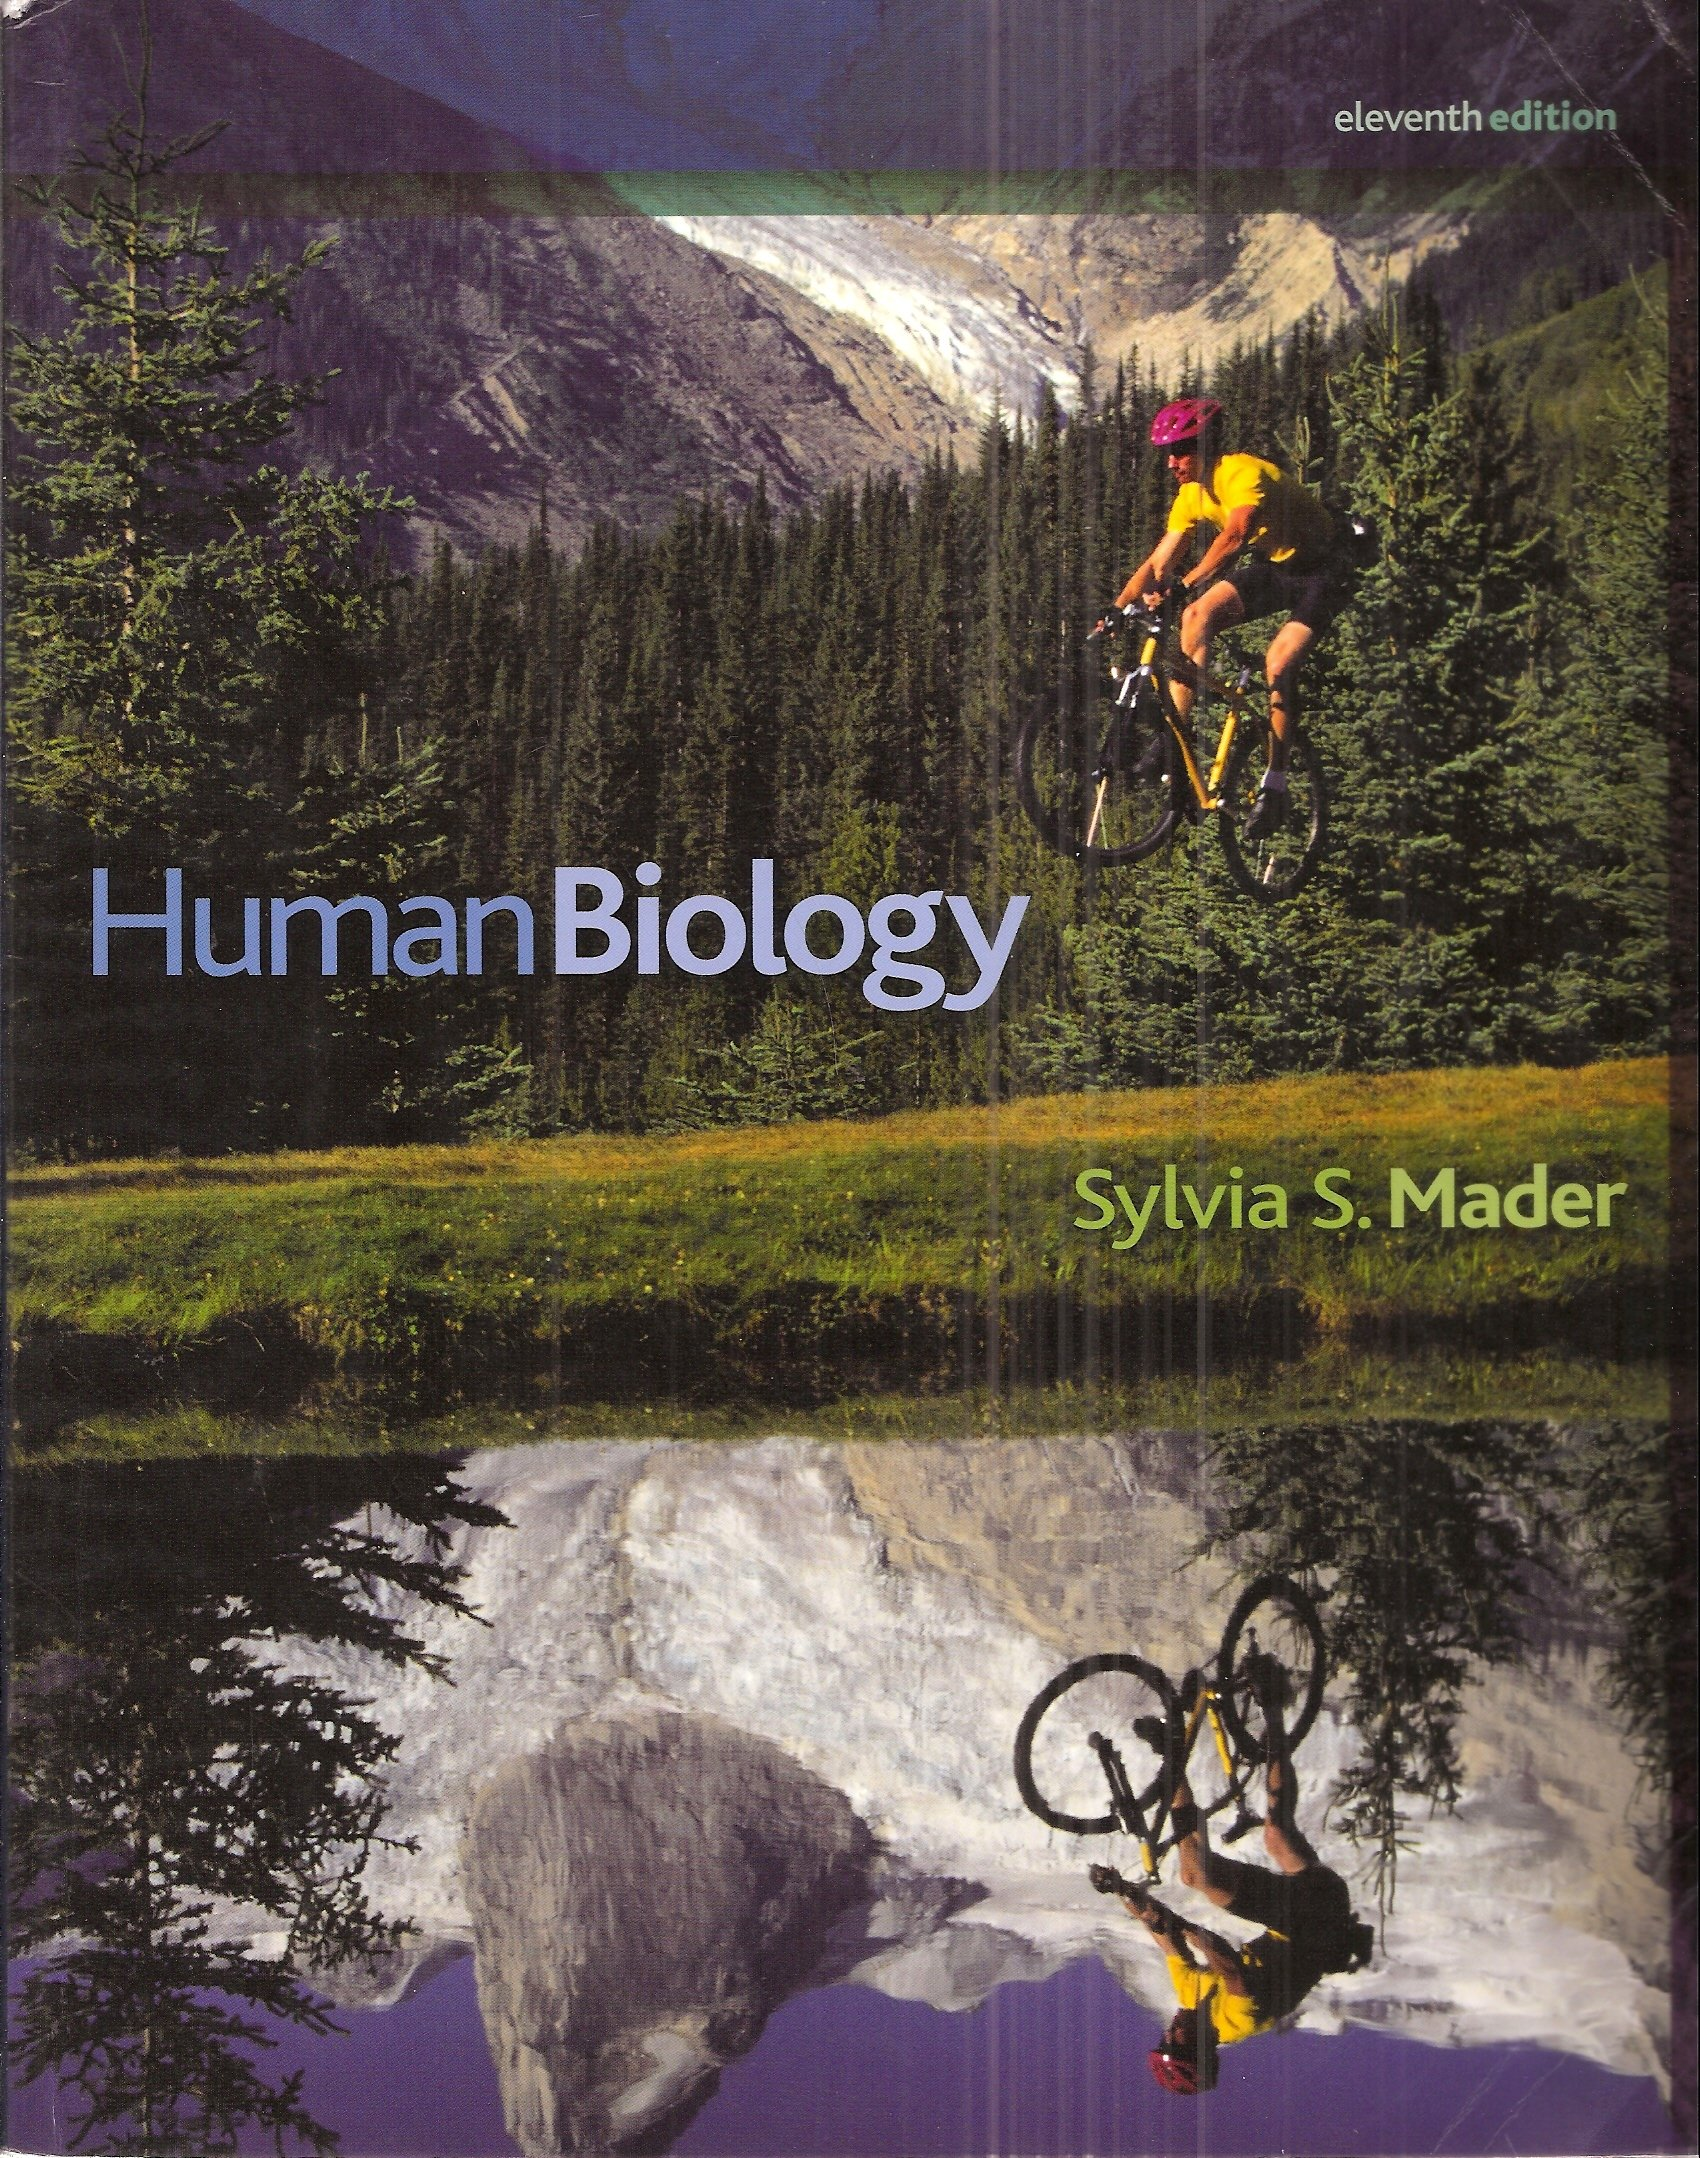 human biology eleventh edition sylvia s mader 9780073377988 rh amazon com Sylvia Mader Lab Manual Answers General Biology Laboratory Manual